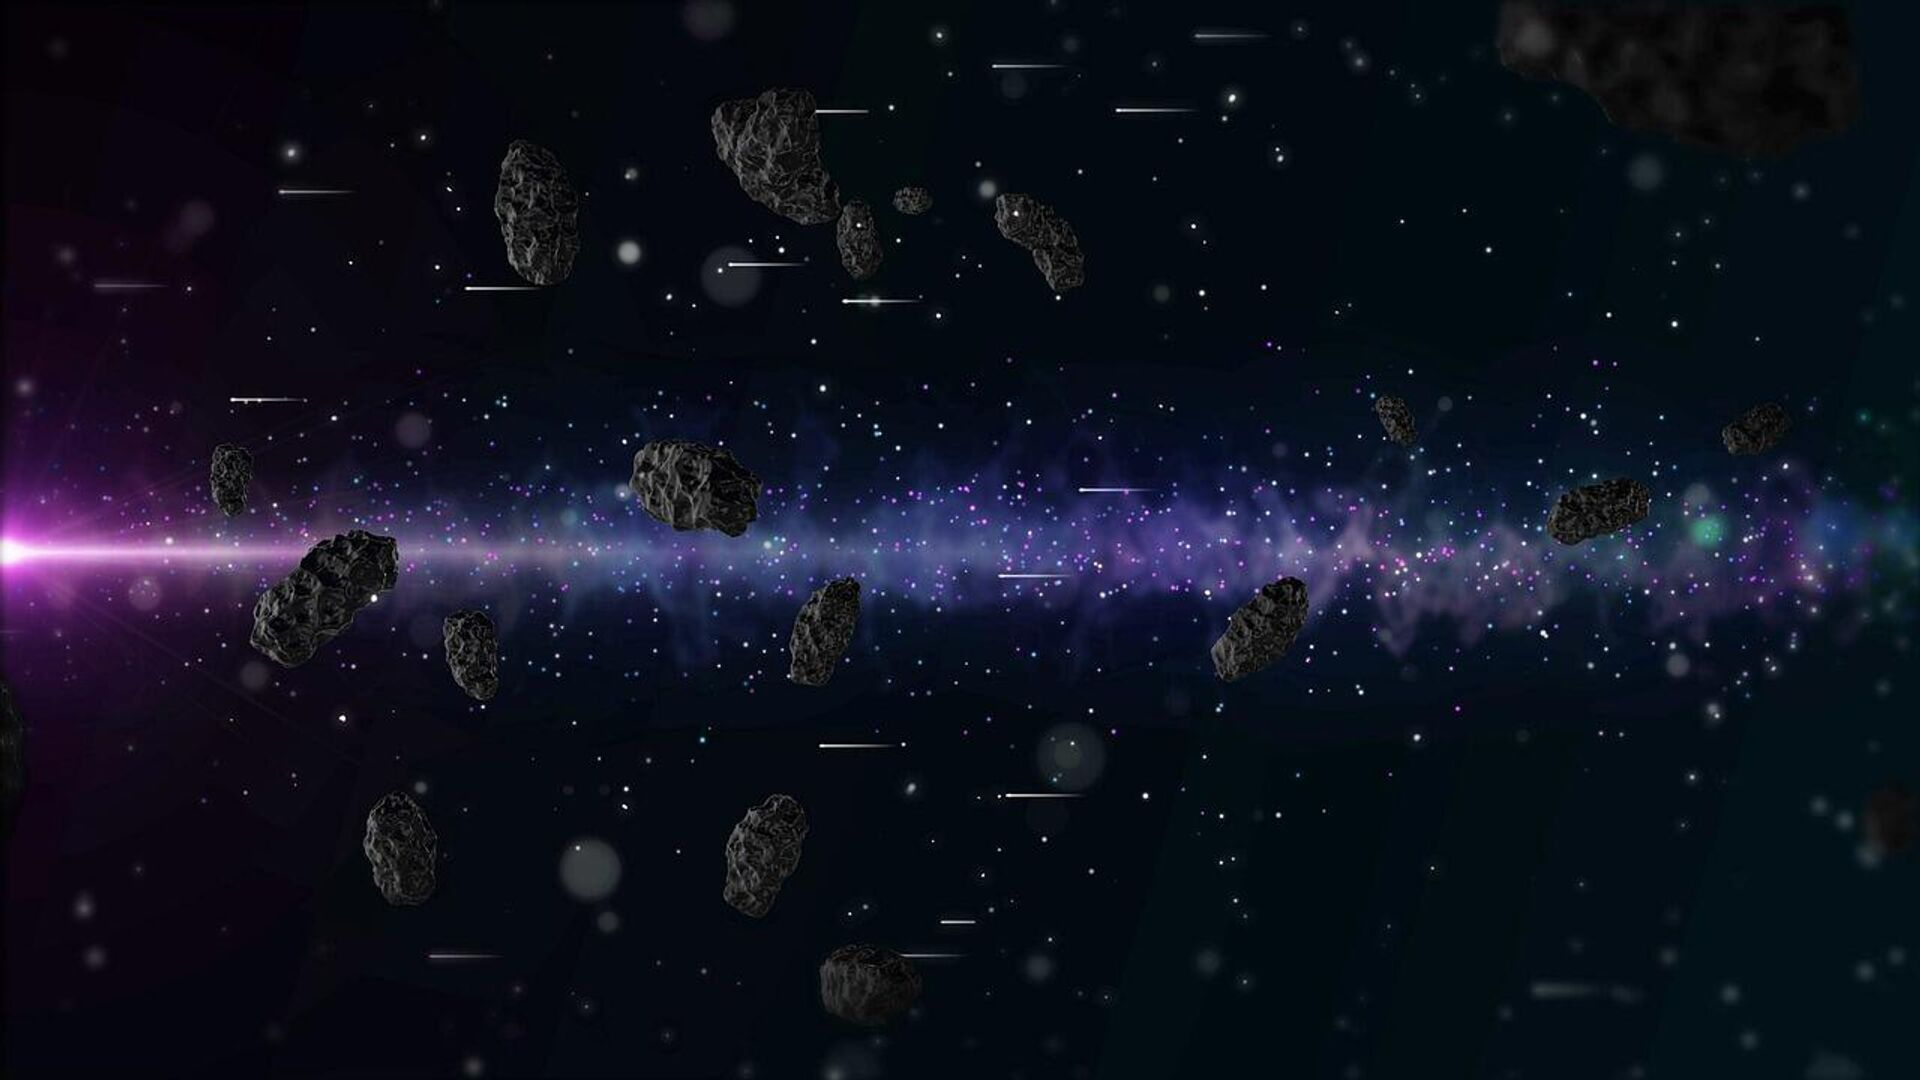 Asteroides (referencial) - Sputnik Mundo, 1920, 30.06.2021